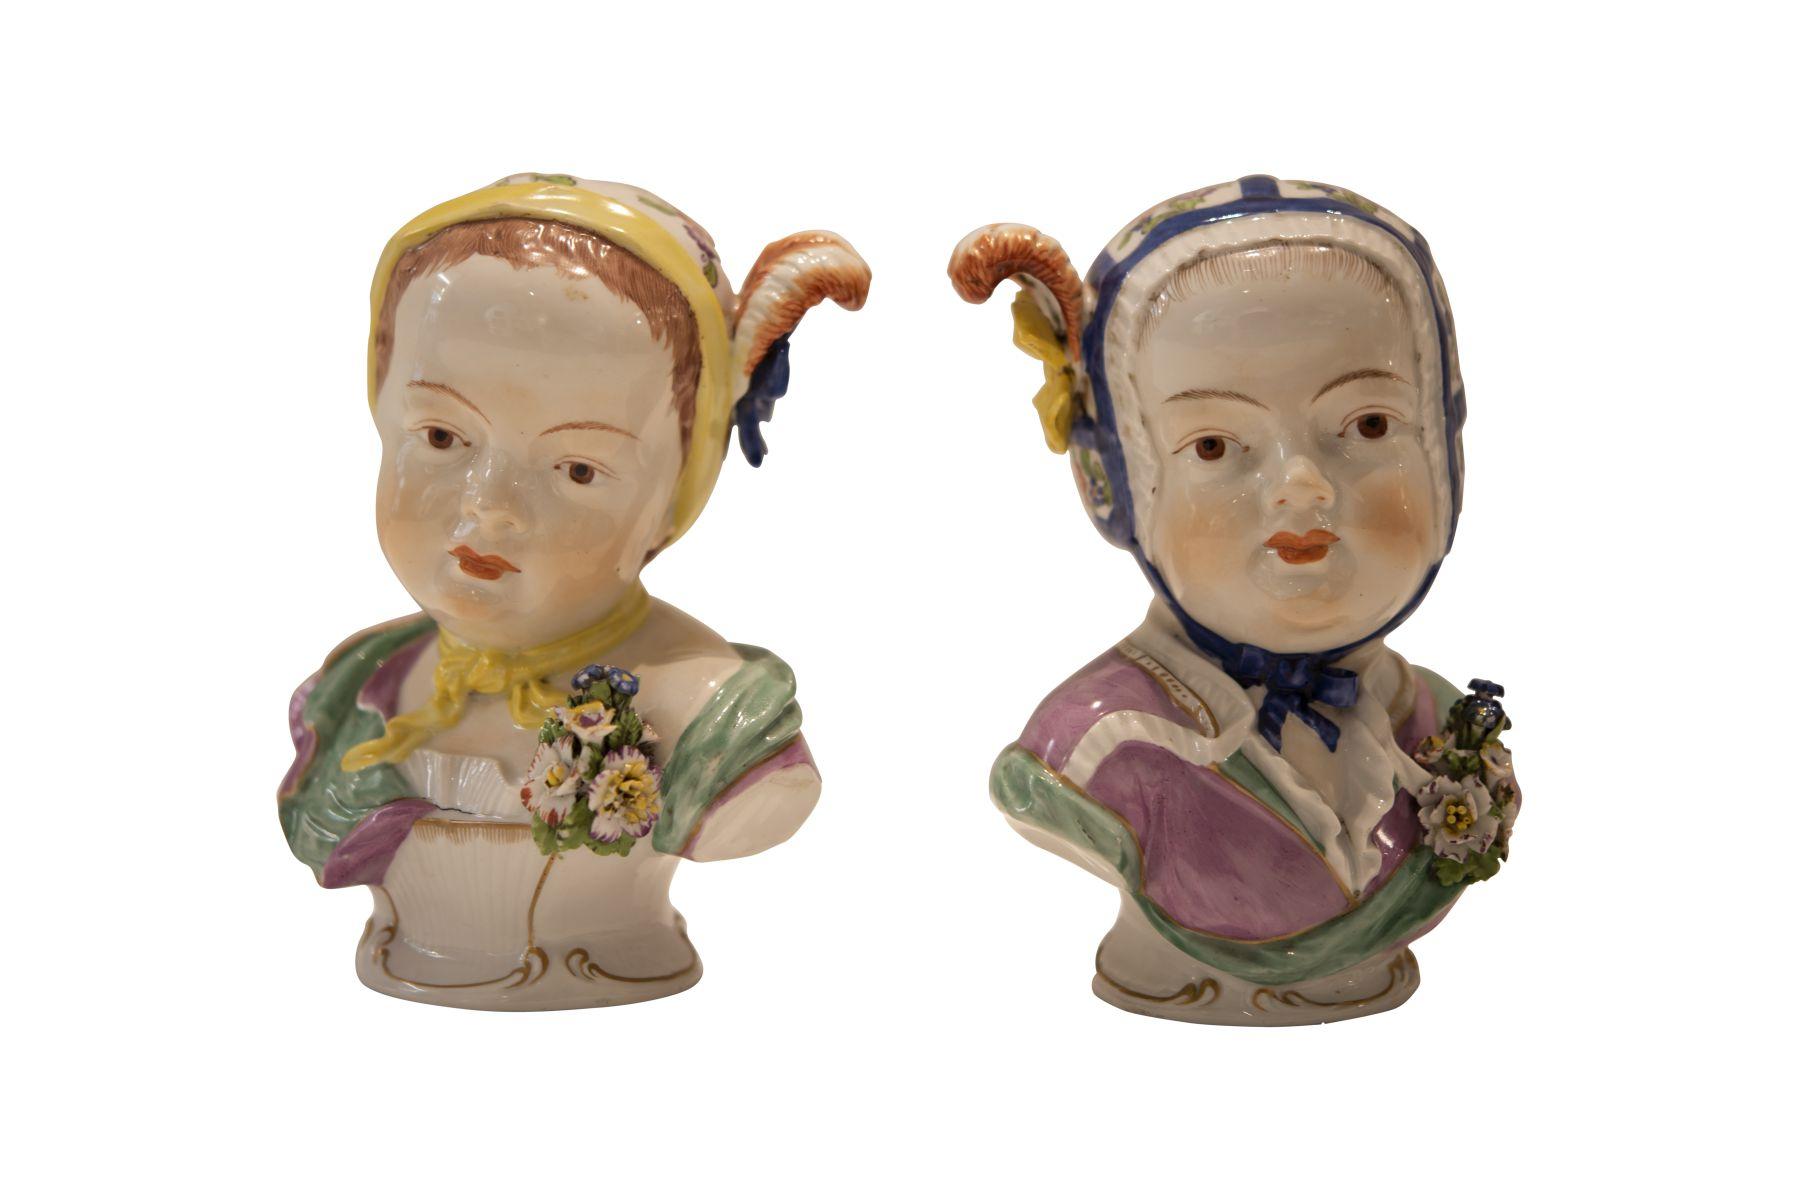 "#244 Two porcelain figures ""Children heads"" Viennese Porcelain Manufacture | Zwei Porzellan Figuren ""Kinderköpfe"" Wiener Porzellan Manufactur Image"